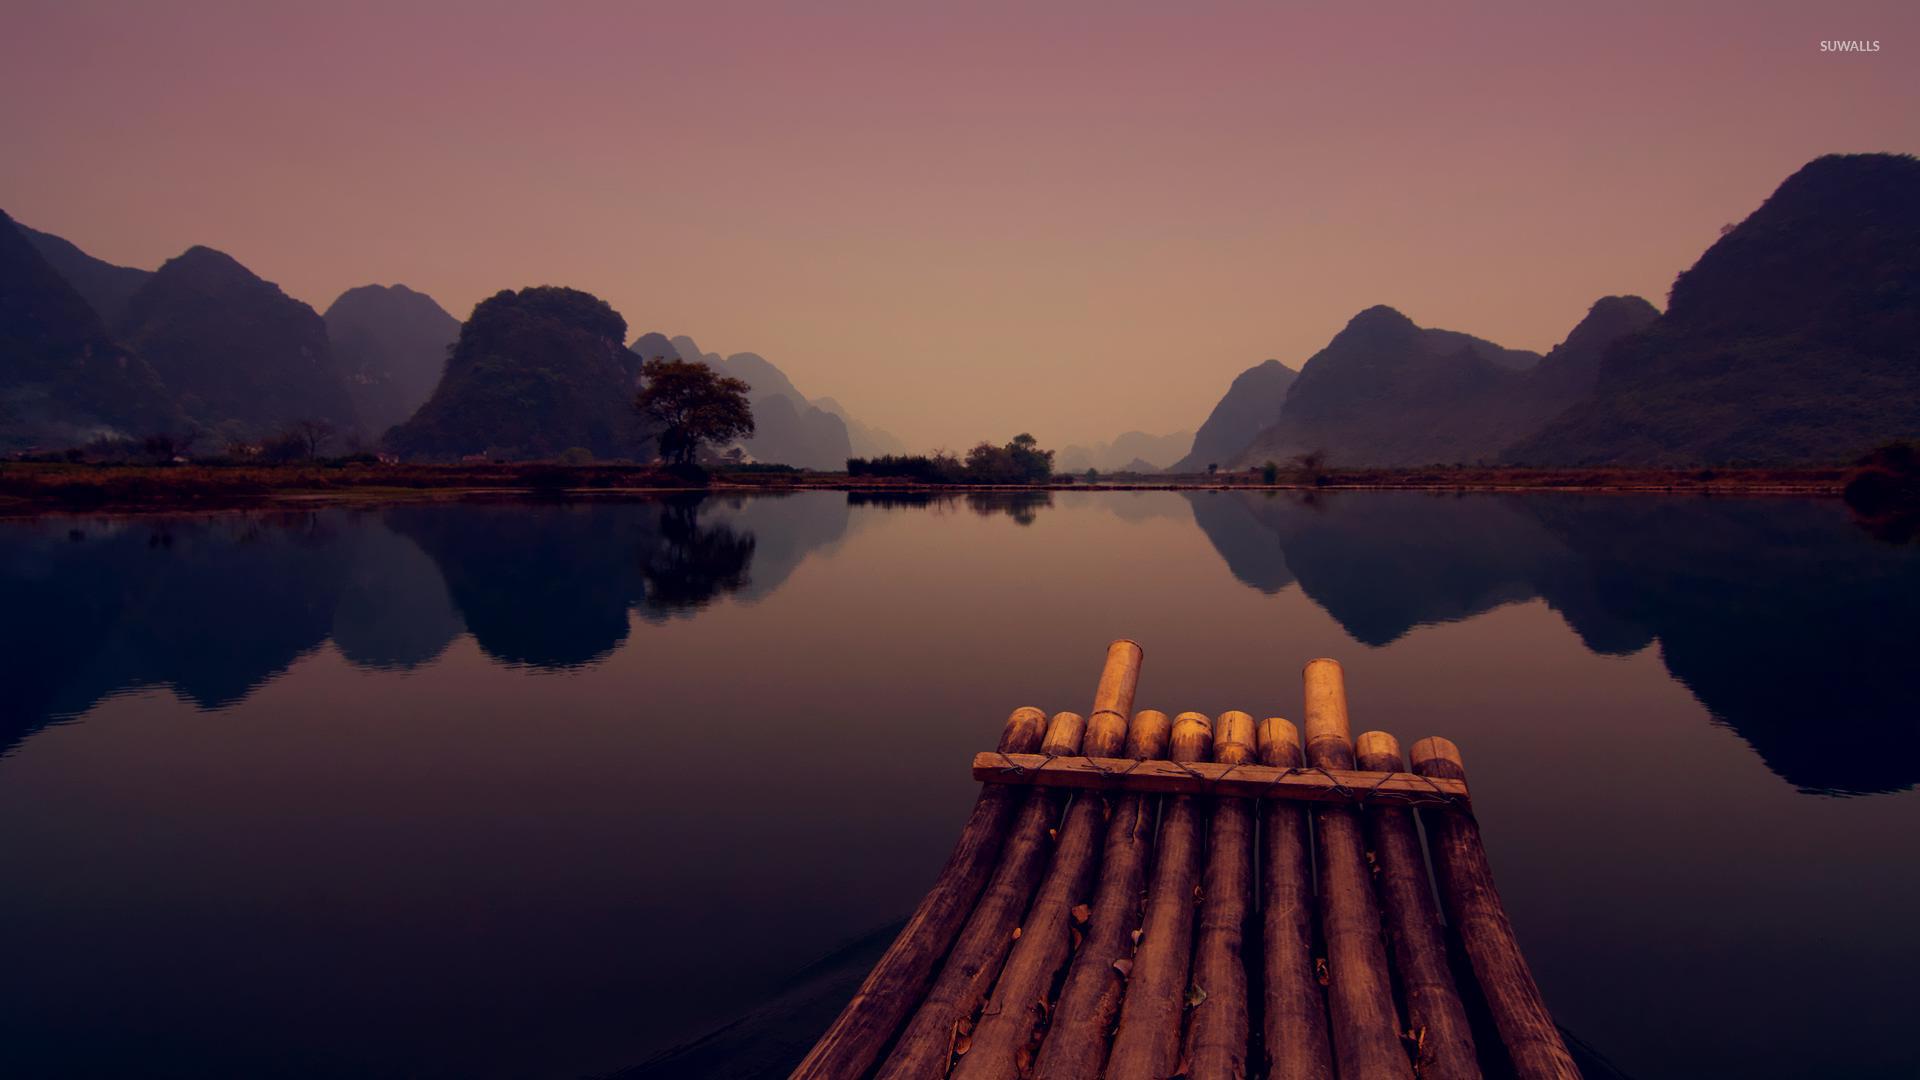 Raft on lake wallpaper   Photography wallpapers   16324 1920x1080